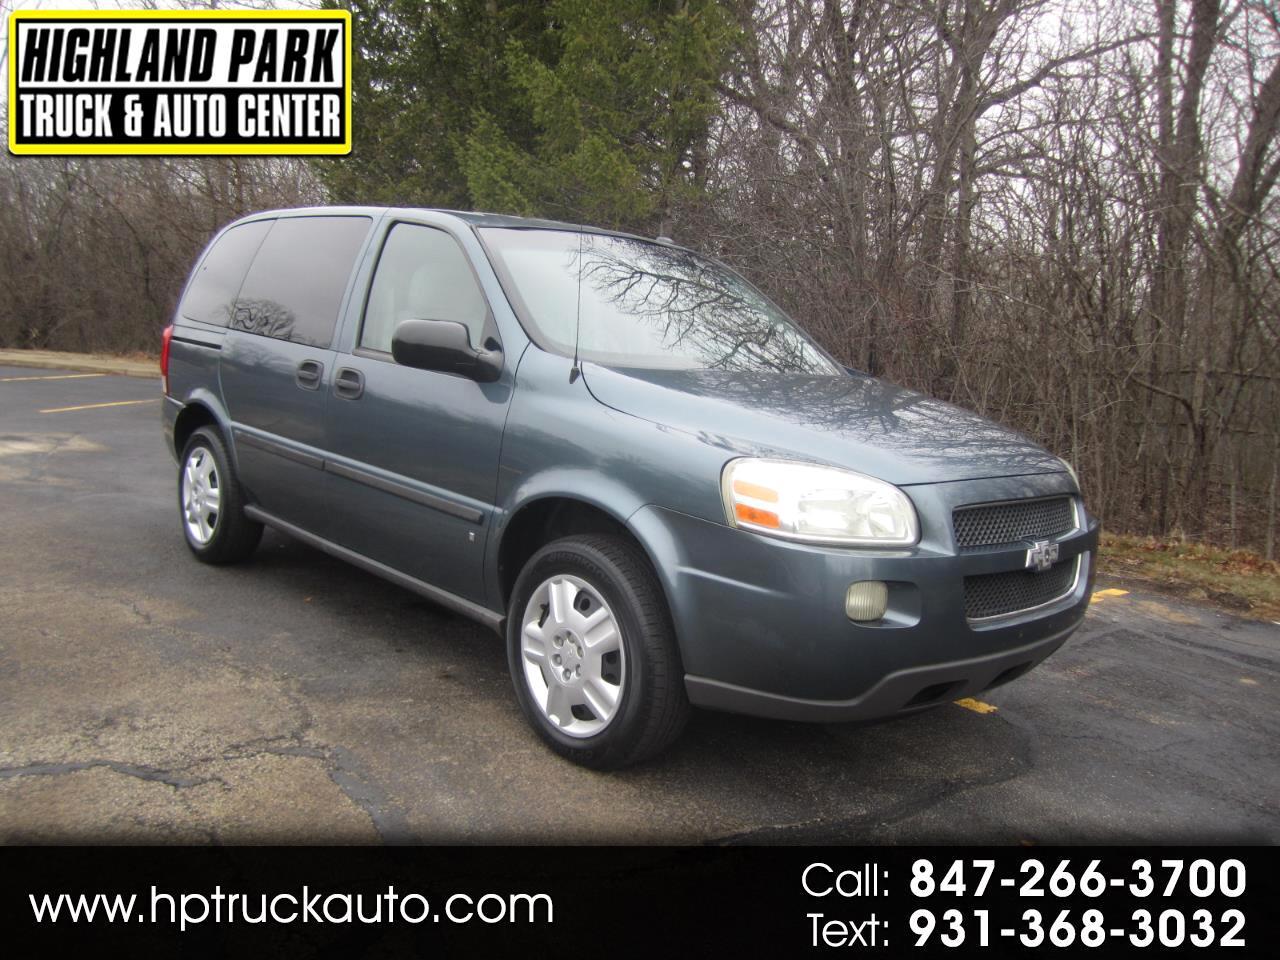 2007 Chevrolet Uplander LS 1LS